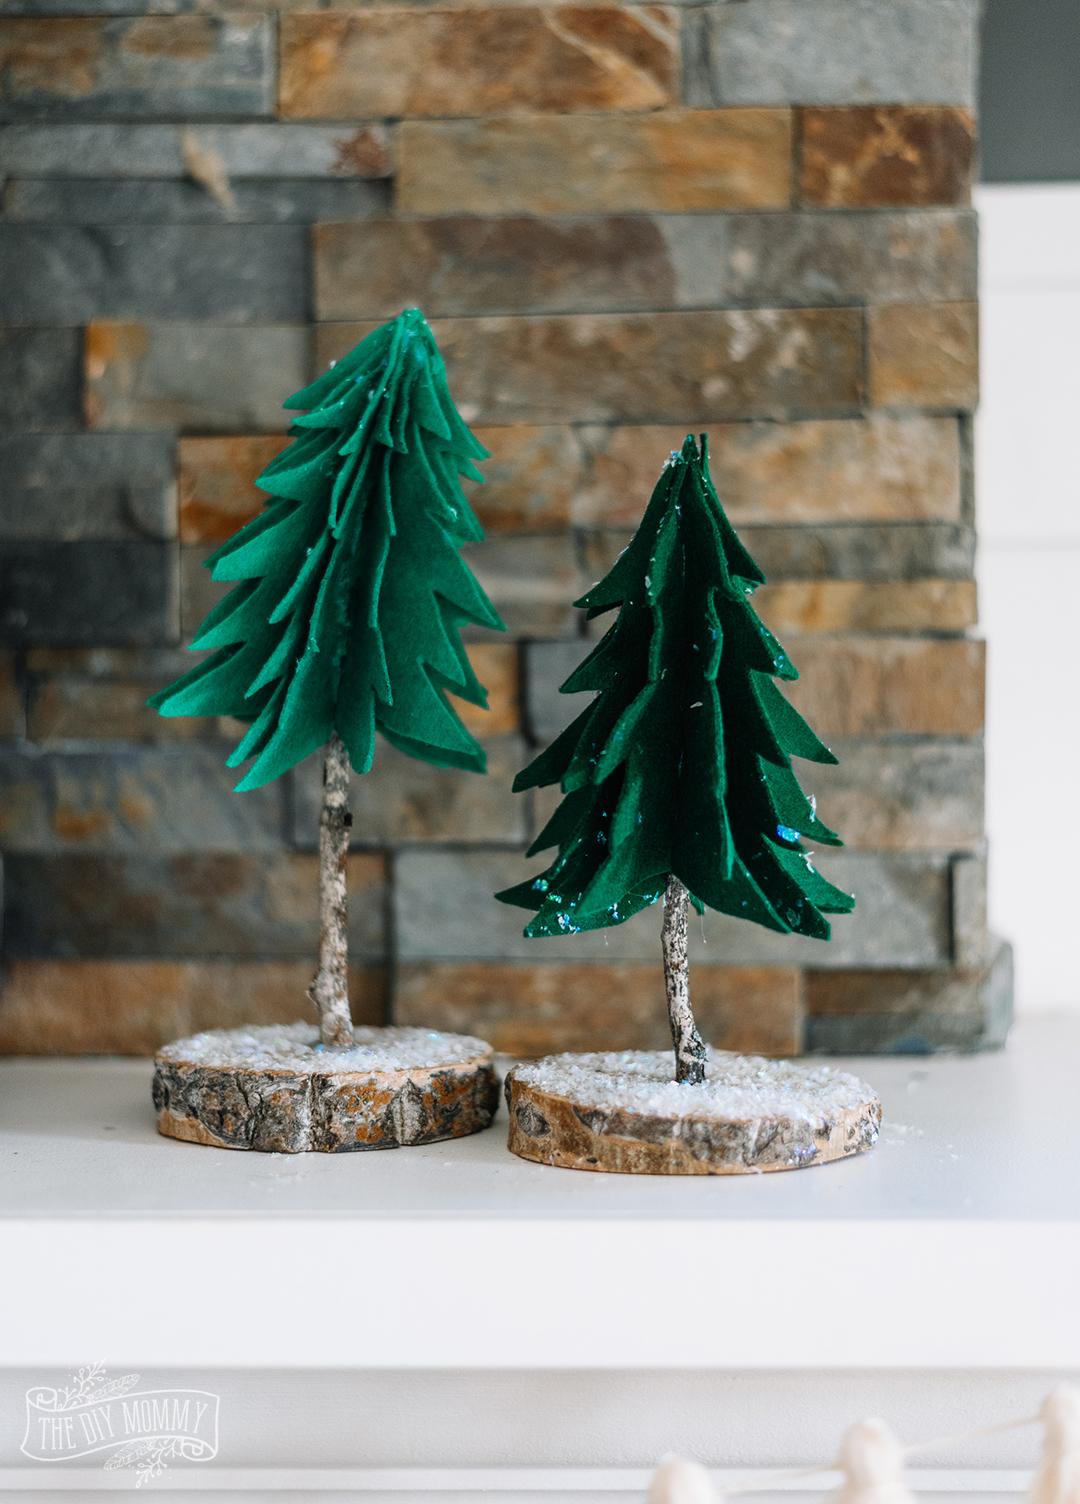 Make Rustic Felt & Wood Trees for Winter & Christmas Decor